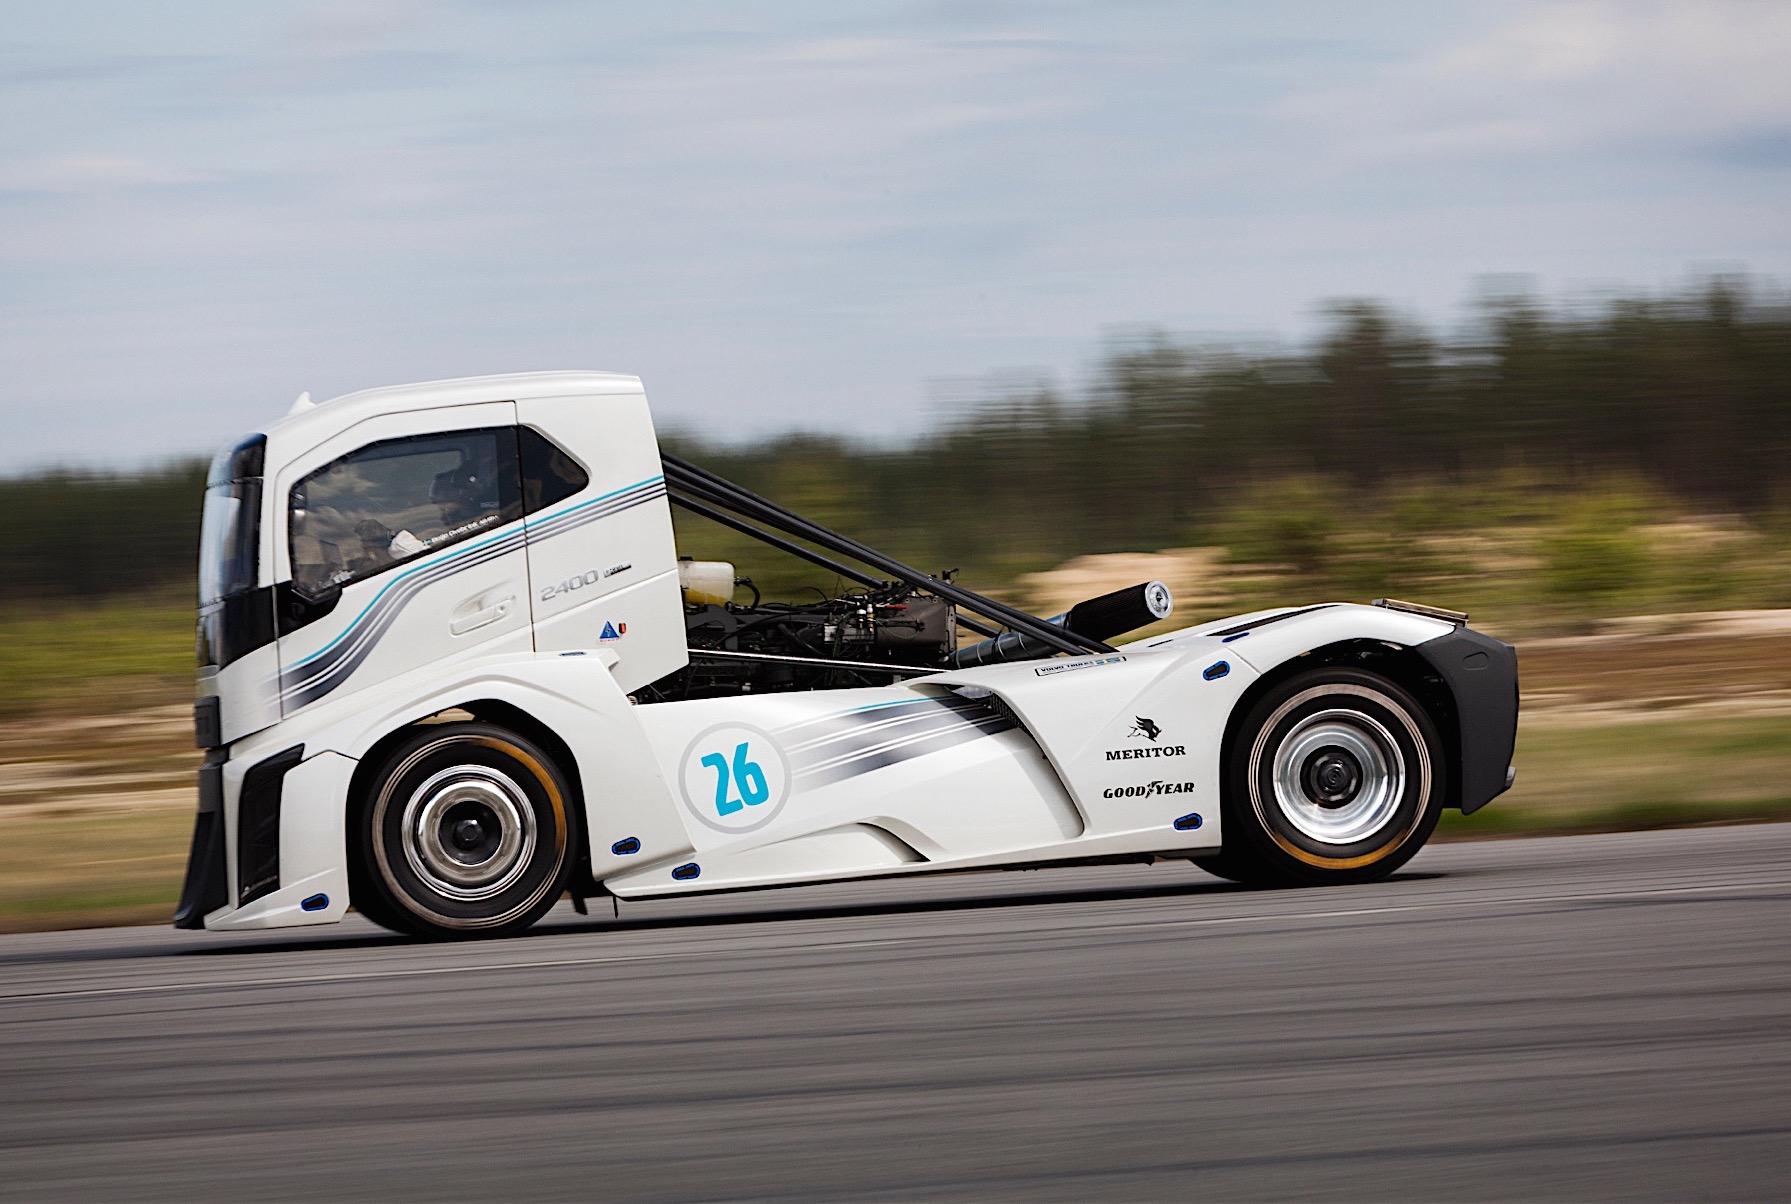 Volvo Iron Knight Truck Breaks Speed Records 0 100km H In